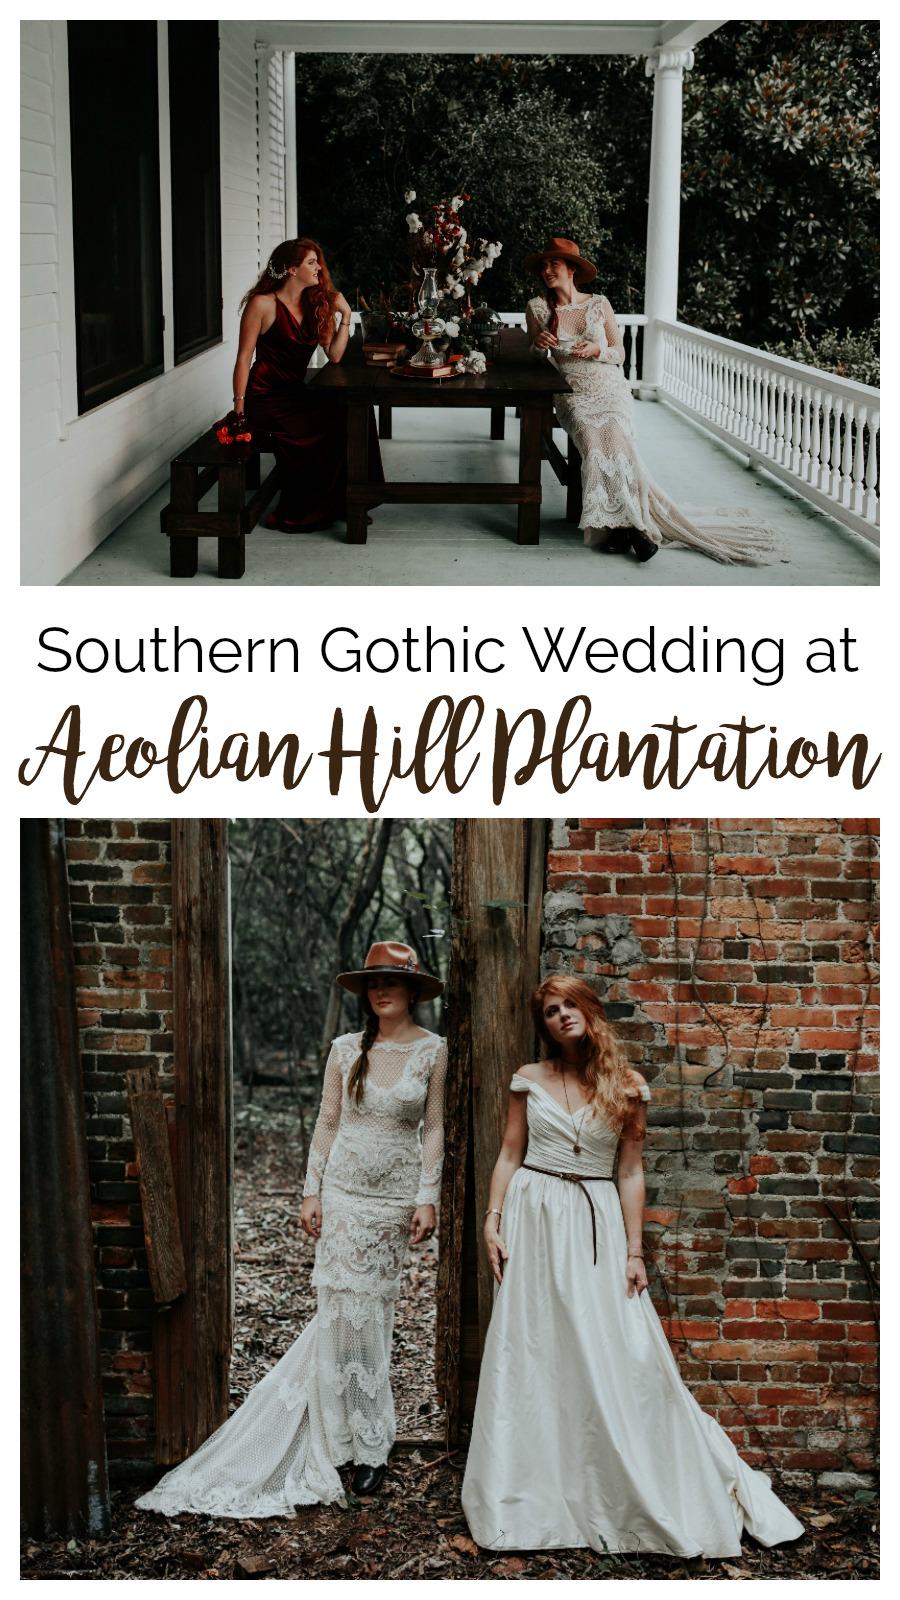 Southern Gothic Wedding Styled Shoot at Aeolian Hill Plantation | Palmetto State Weddings | Carrie Elizabeth Photography | romantic Southern wedding | grunge wedding | edgy wedding inspiration